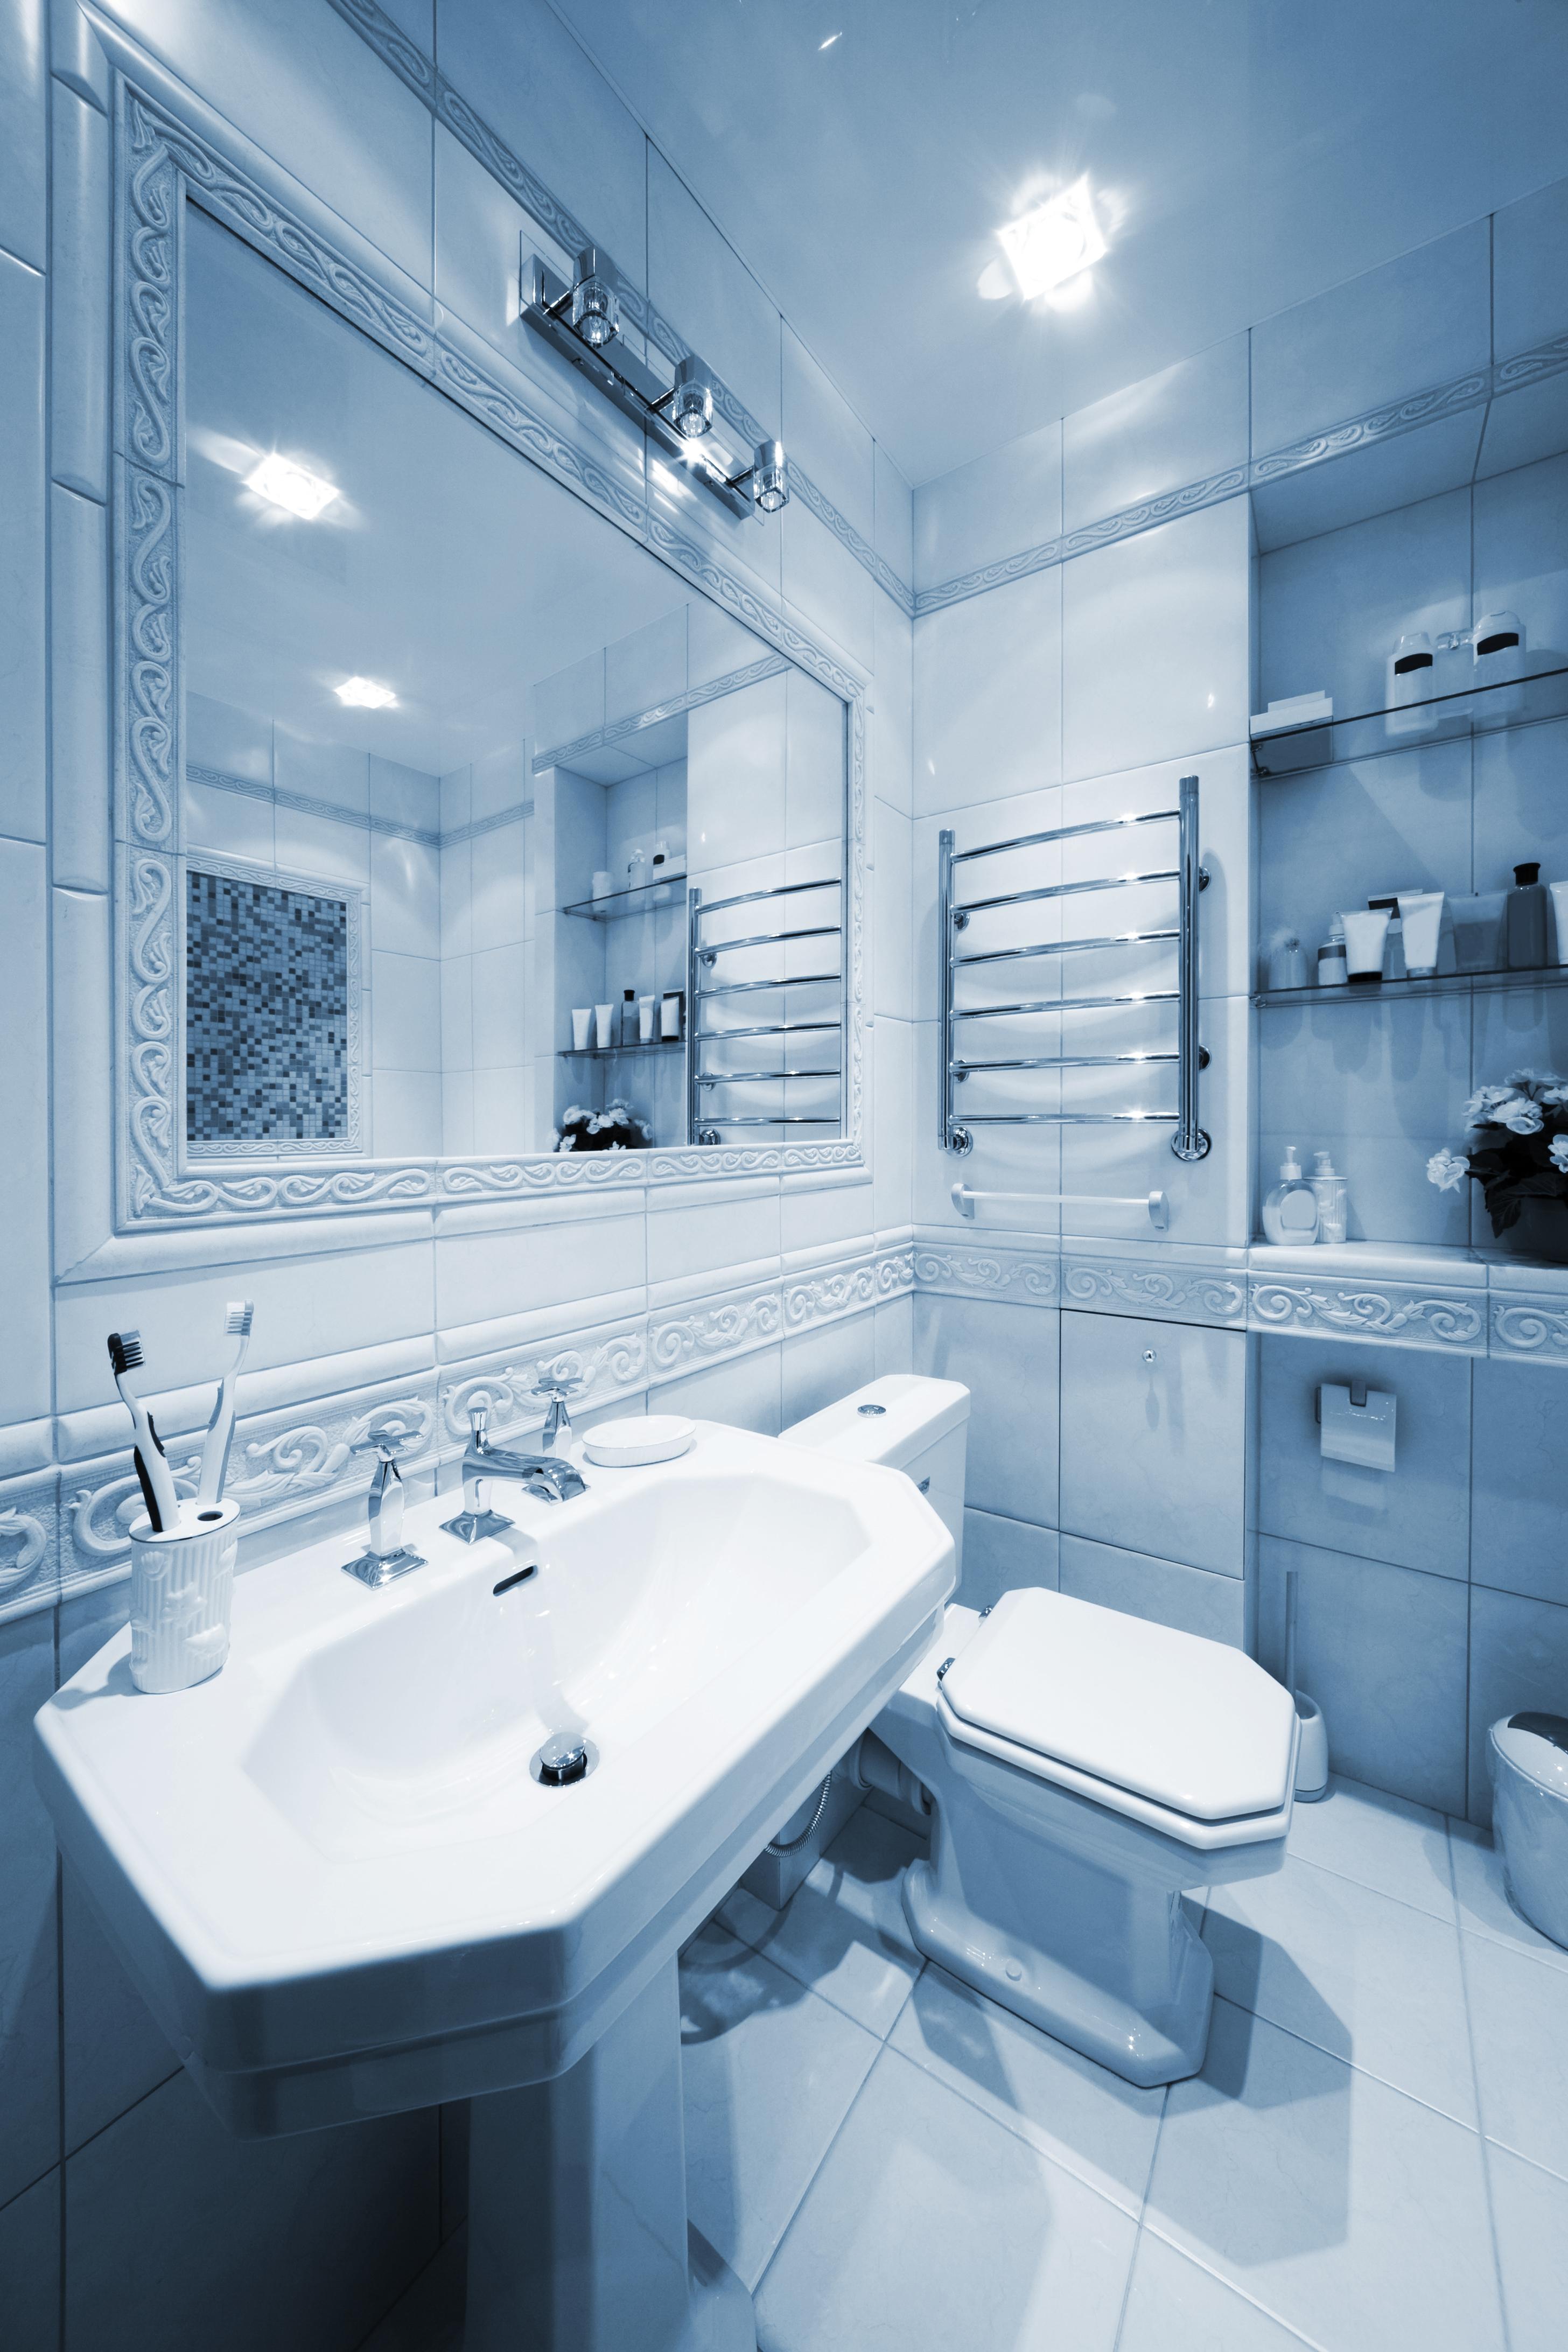 Blogger Bathroom Light Bathroom Light Switch Wiring